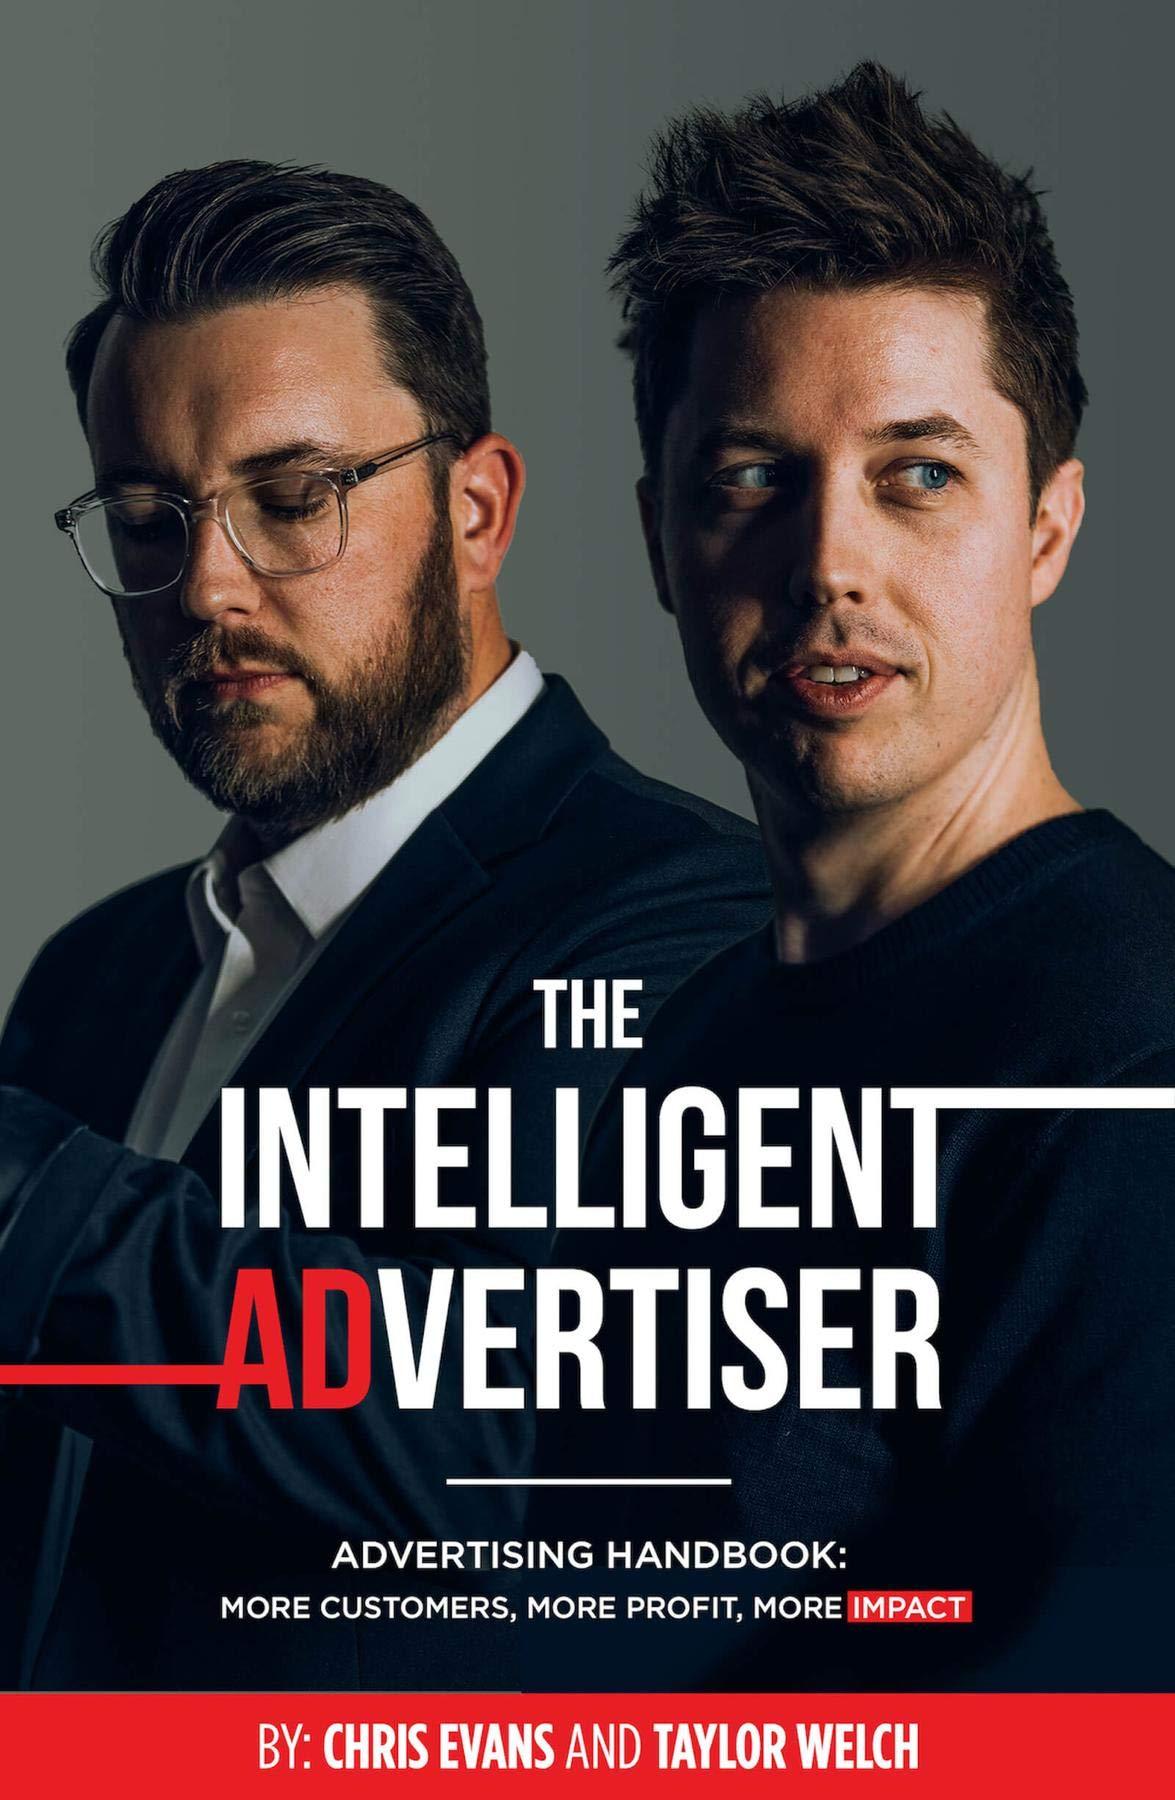 The Intelligent Advertiser: Advertising Handbook: More Customers, More Profit, More Impact